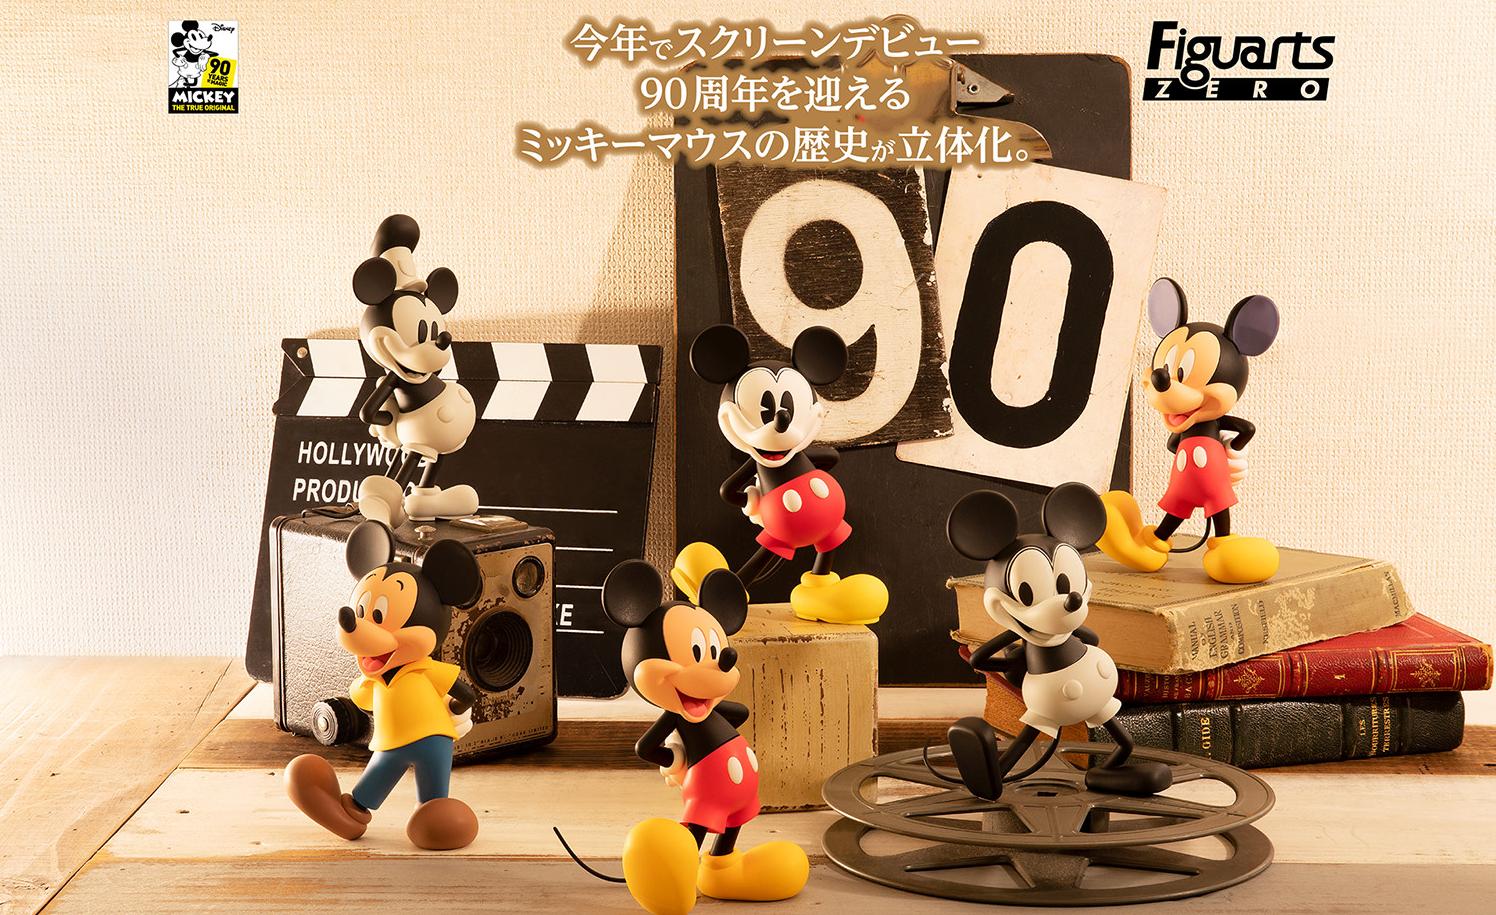 Tamashii Nations celebra i 90 anni di Mickey Mouse